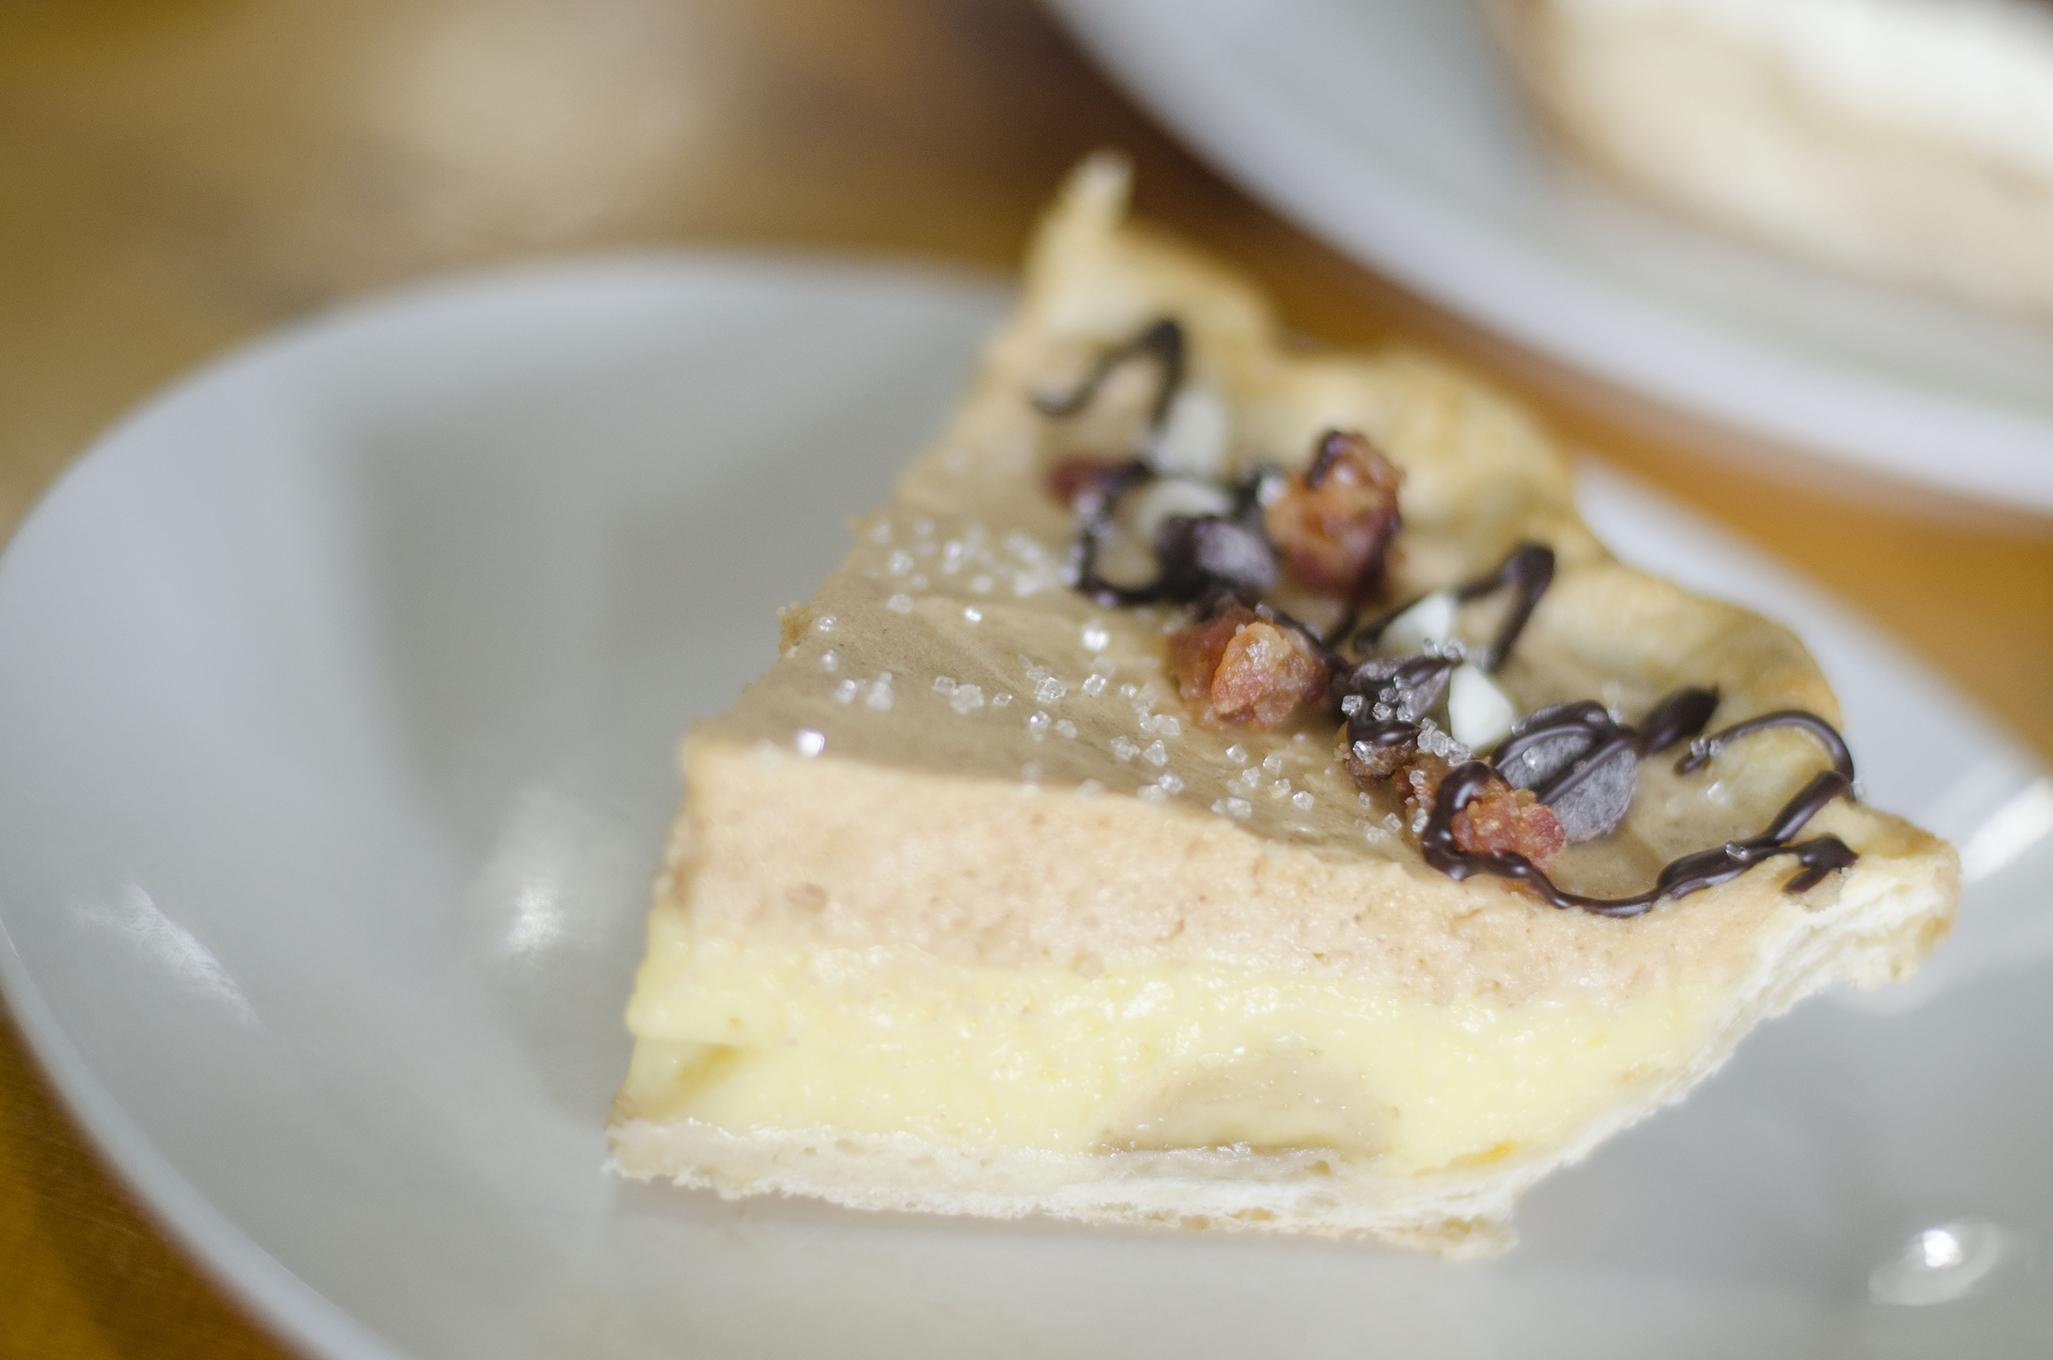 The Elvis Pie from Riverside Pie Cafe in Windsor, Ontario.